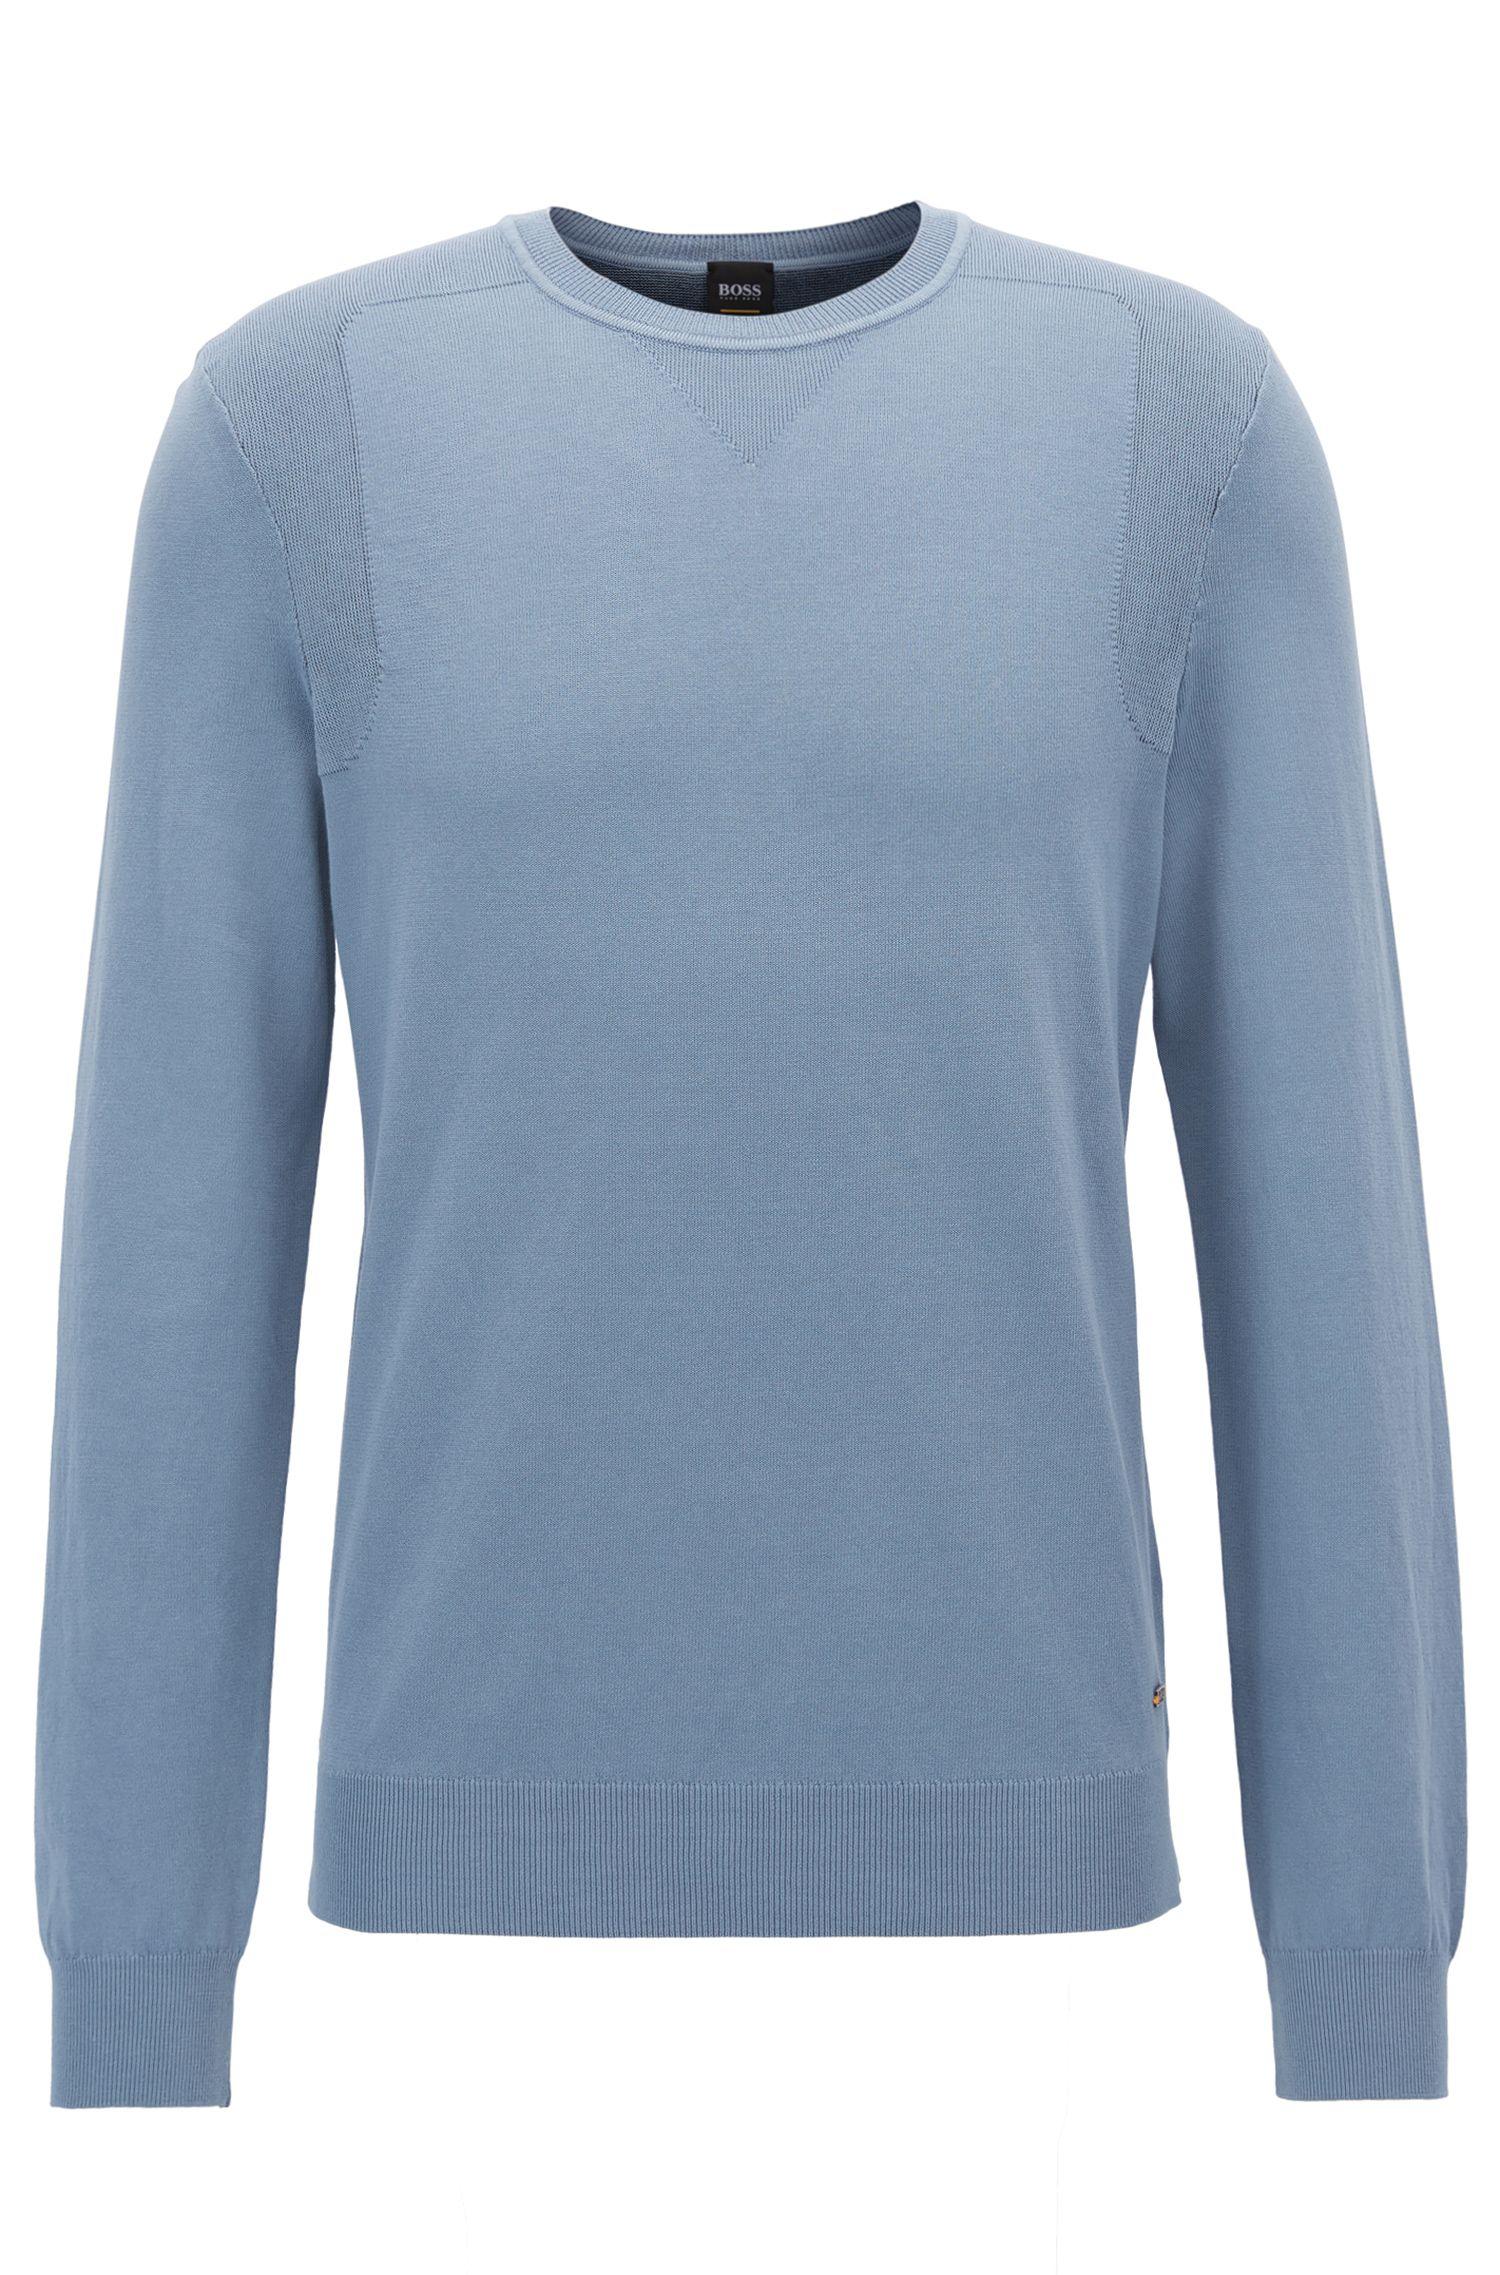 Jersey de punto de algodón teñido en prenda